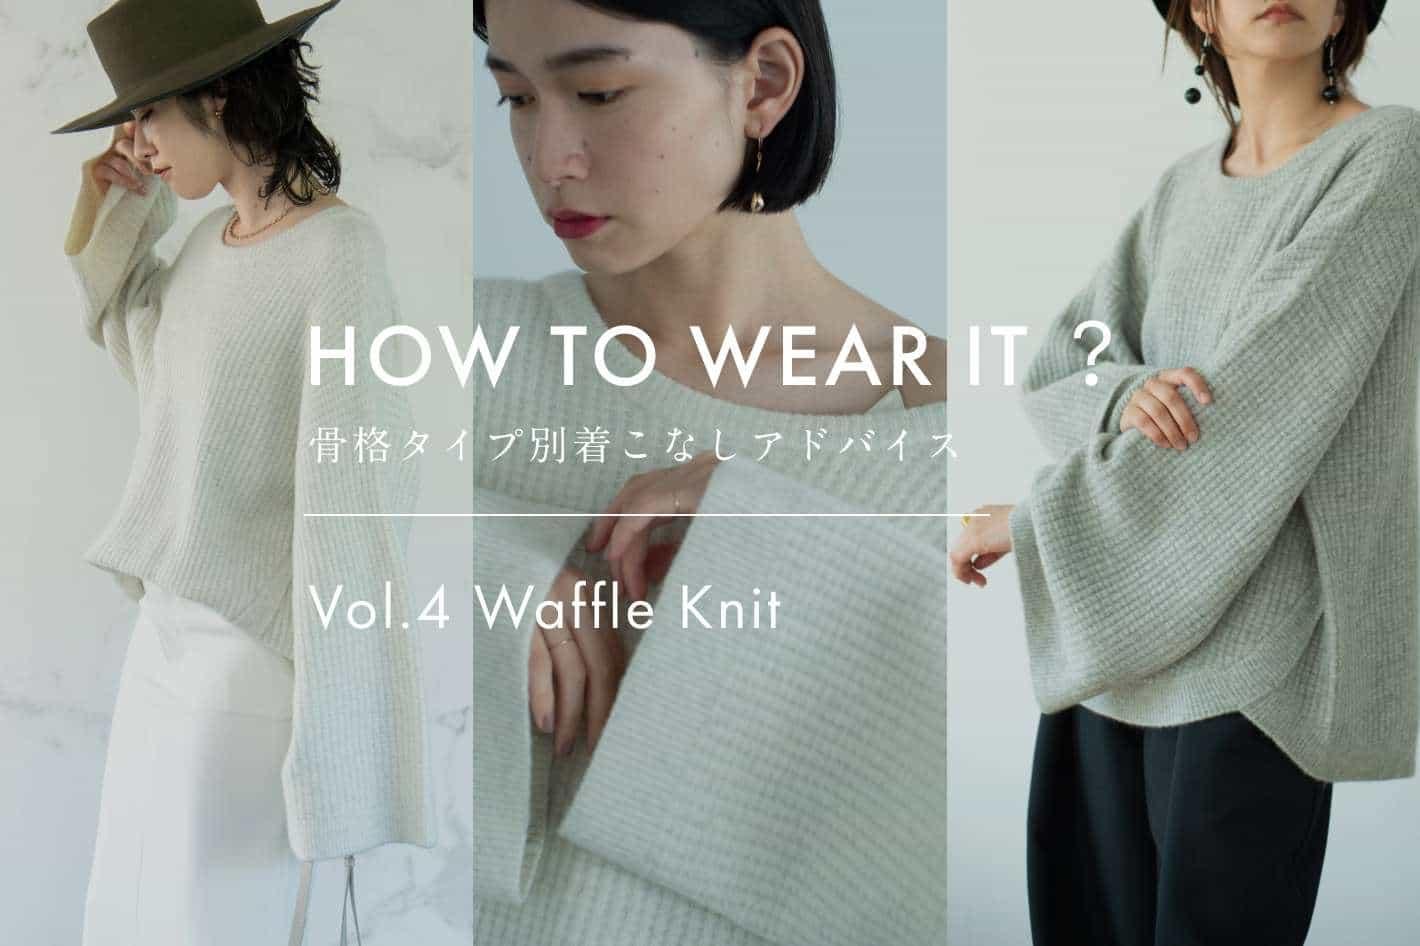 GALLARDAGALANTE どう着れば正解?骨格タイプ別着こなしアドバイス Vol.4 Waffle Knit